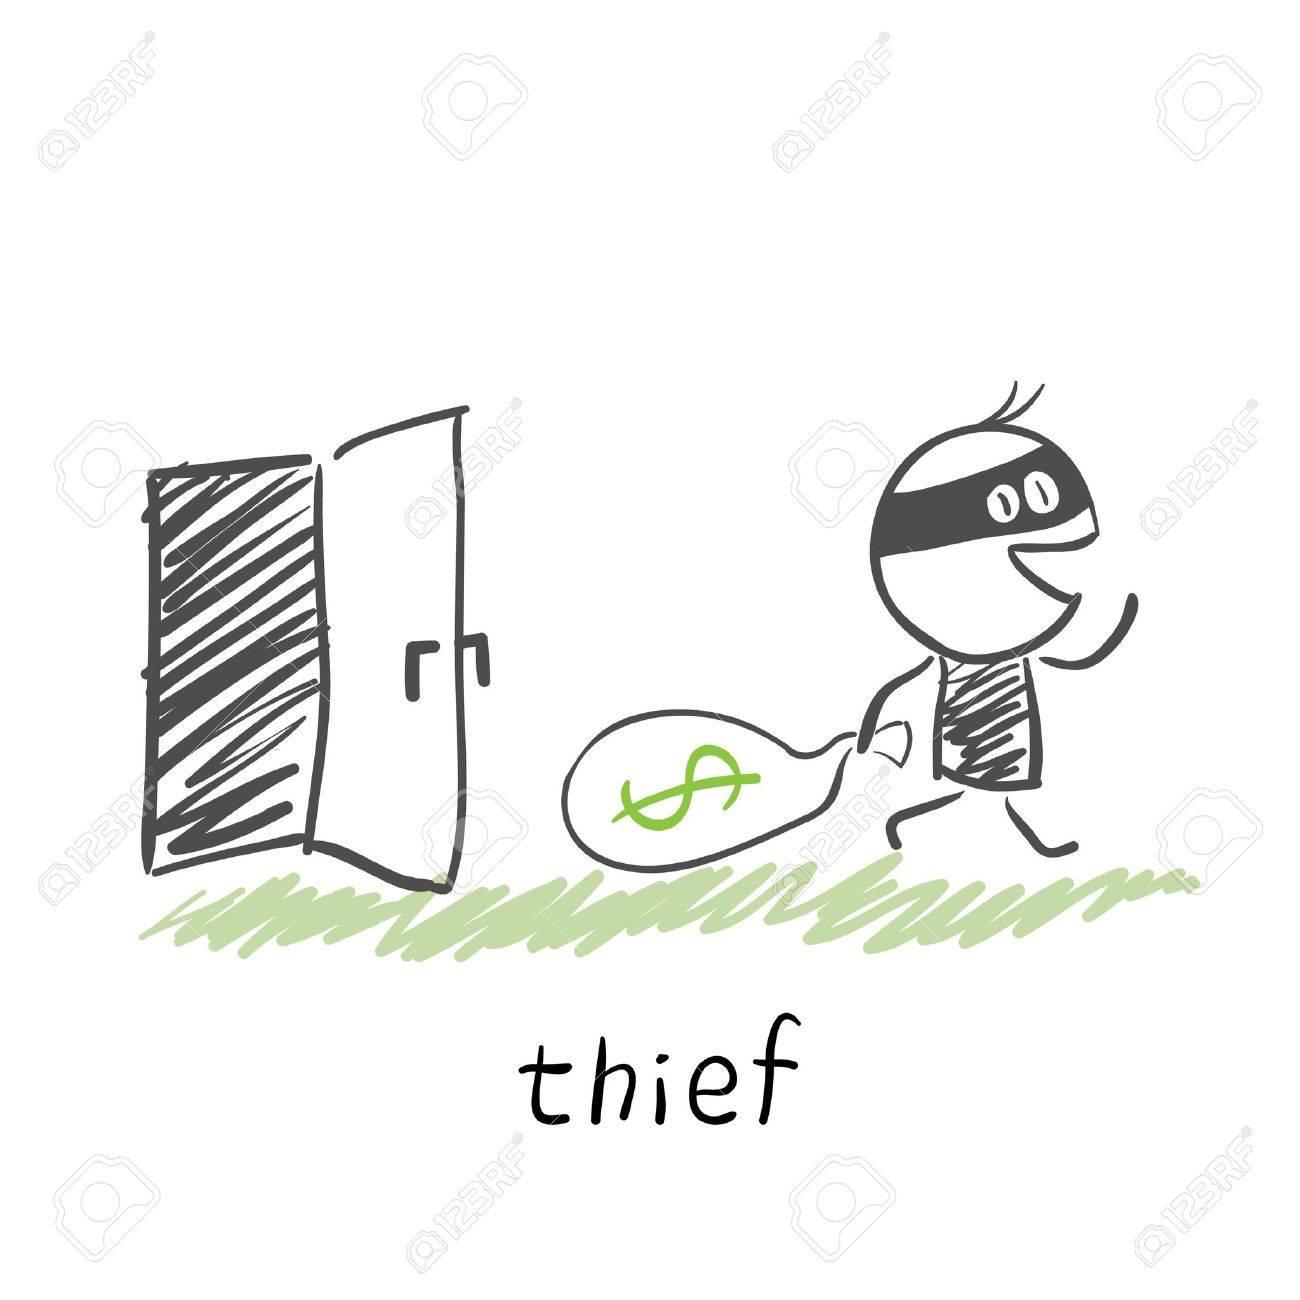 thief Stock Vector - 13272450